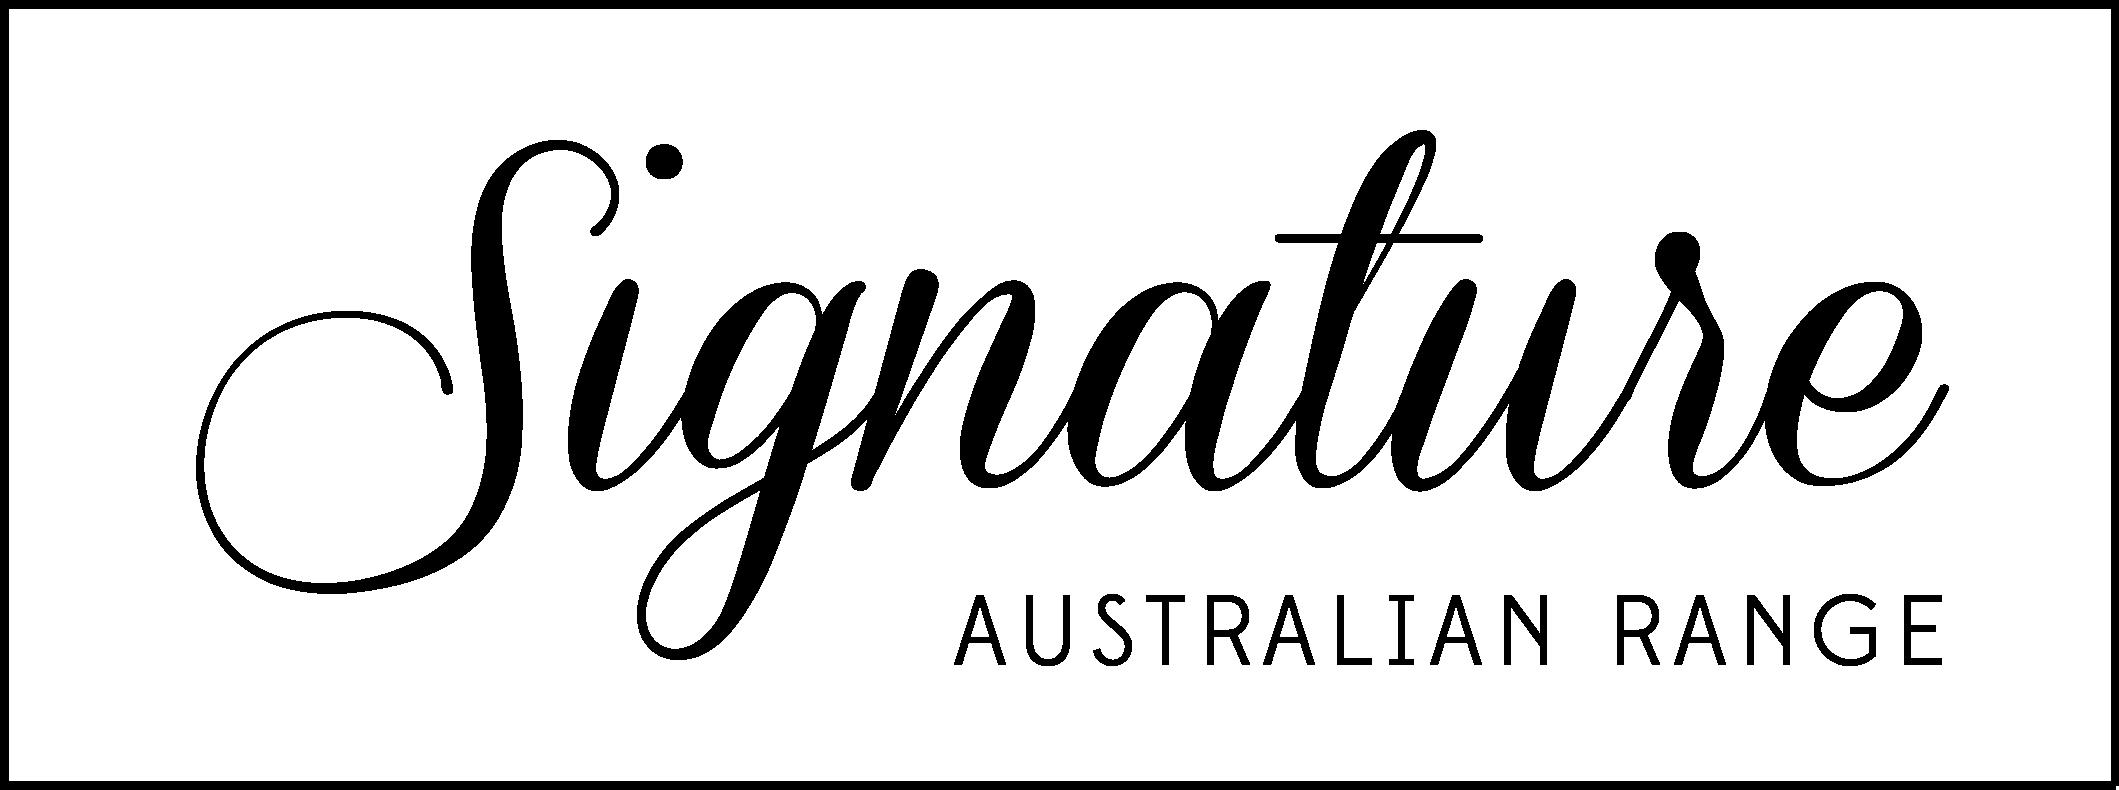 Signature Australian Range logo